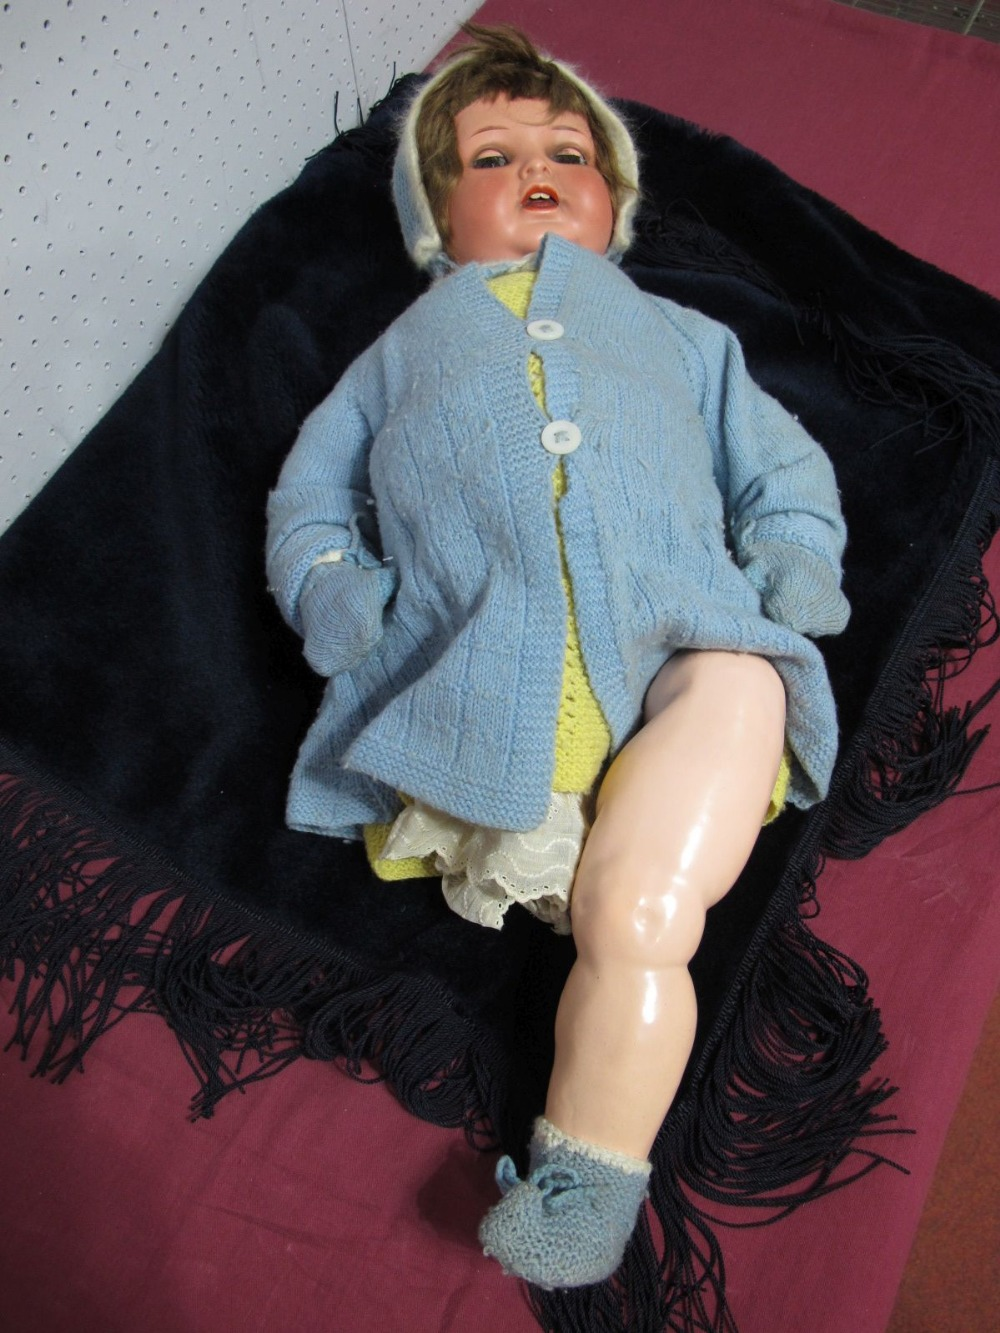 Lot 3 - A 1st Half XX Century Bisque Headed Doll by Heubahn Keppelsdorf, head stamped 342/7, sleepy eyes,